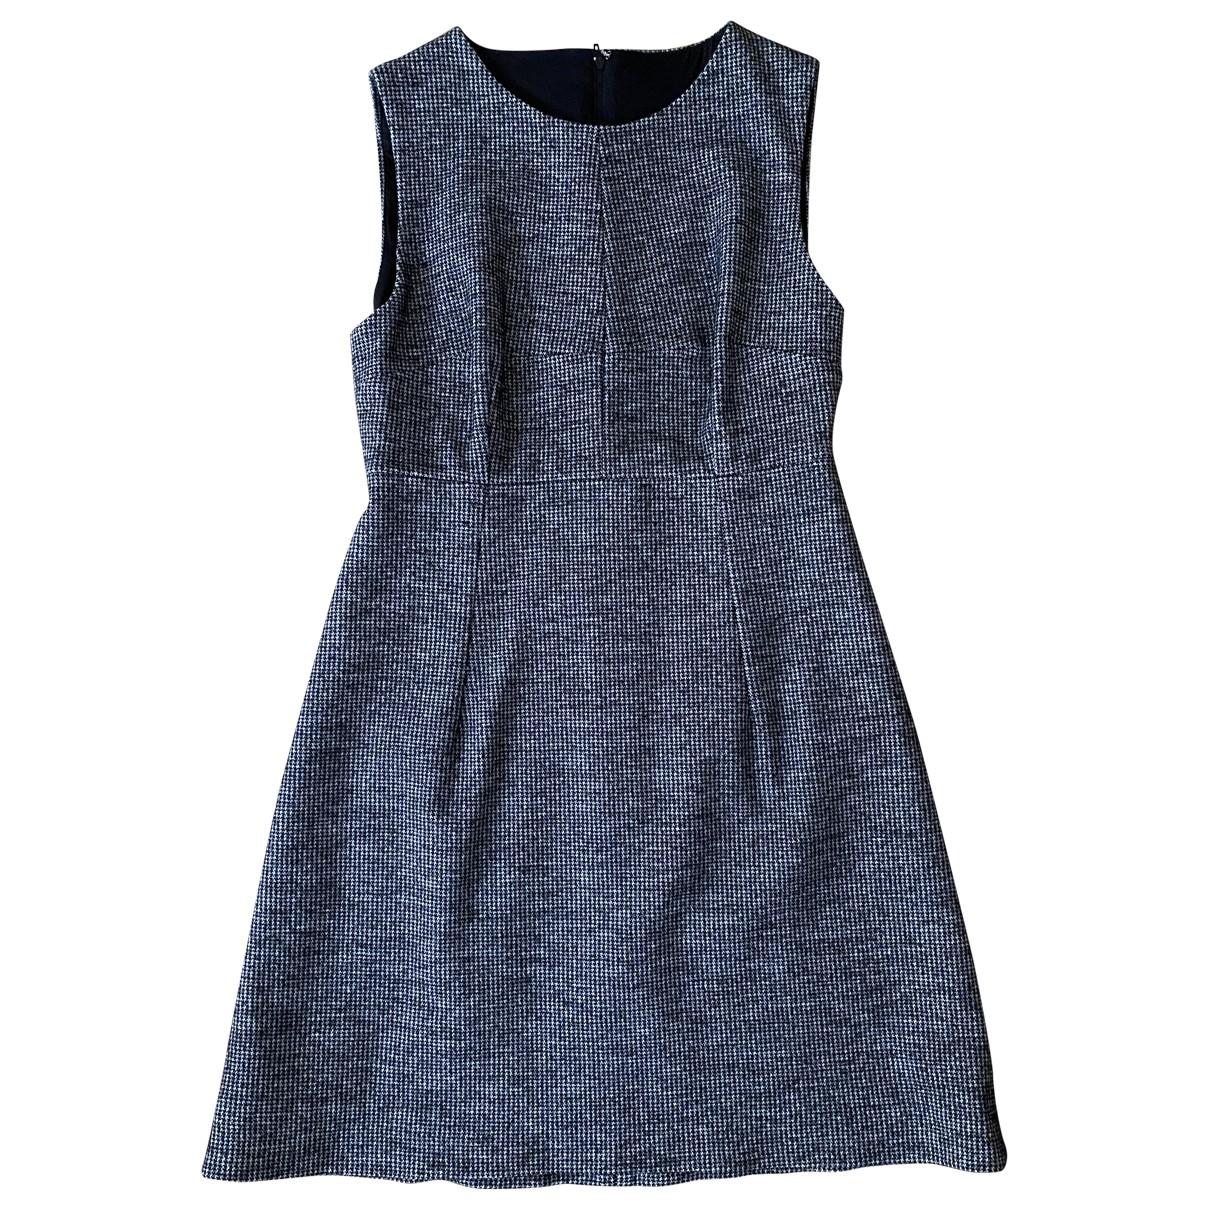 Dolce & Gabbana \N Kleid in  Grau Wolle